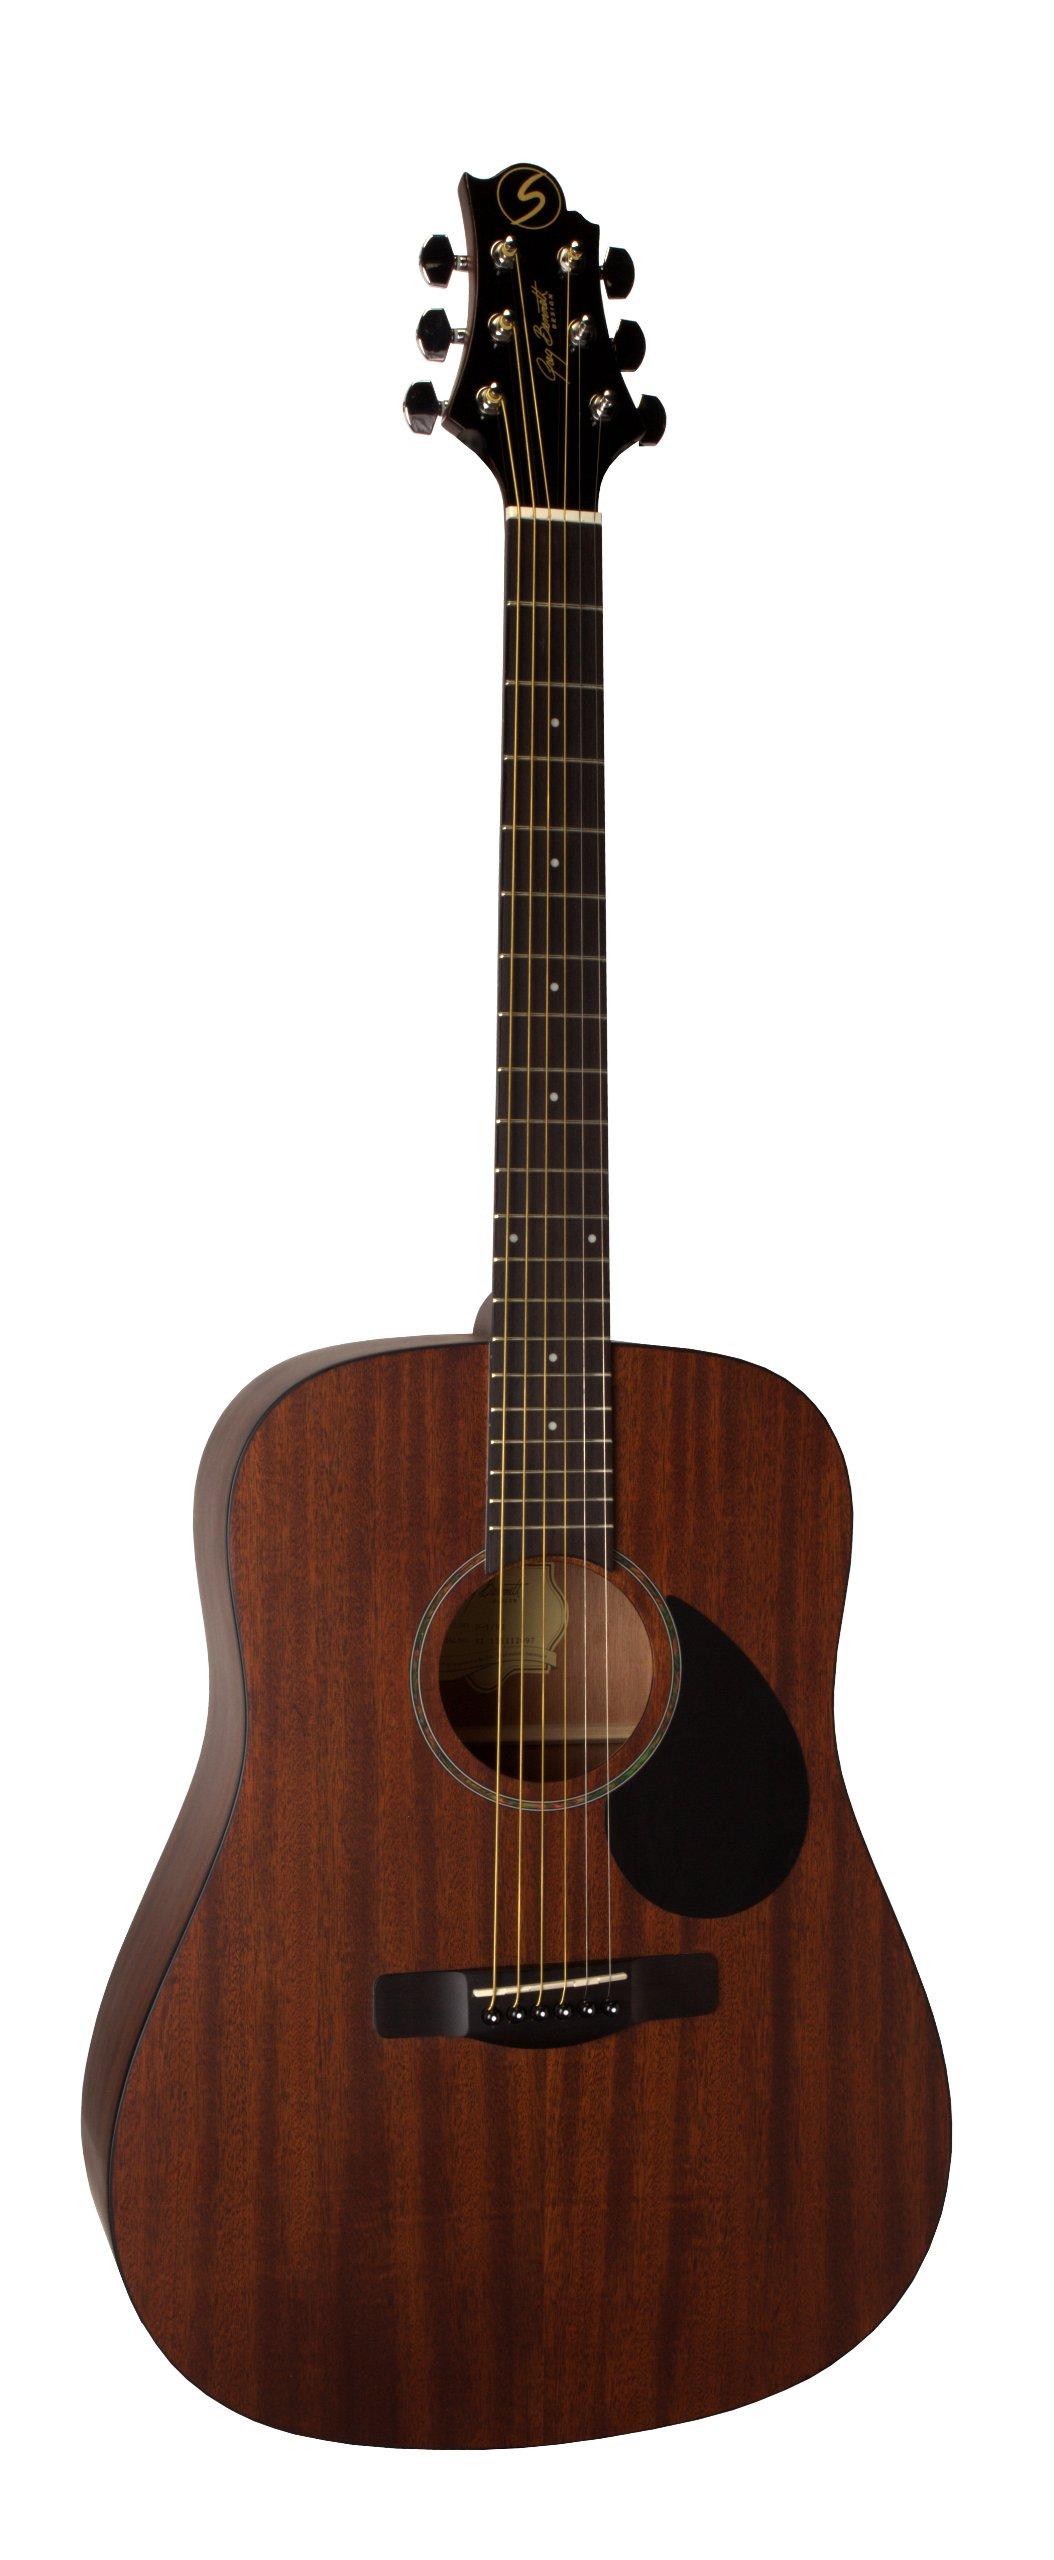 Samick Music Corp Gold Rush D1 SN Dreadnought Acoustic Guitar, Satin Natural